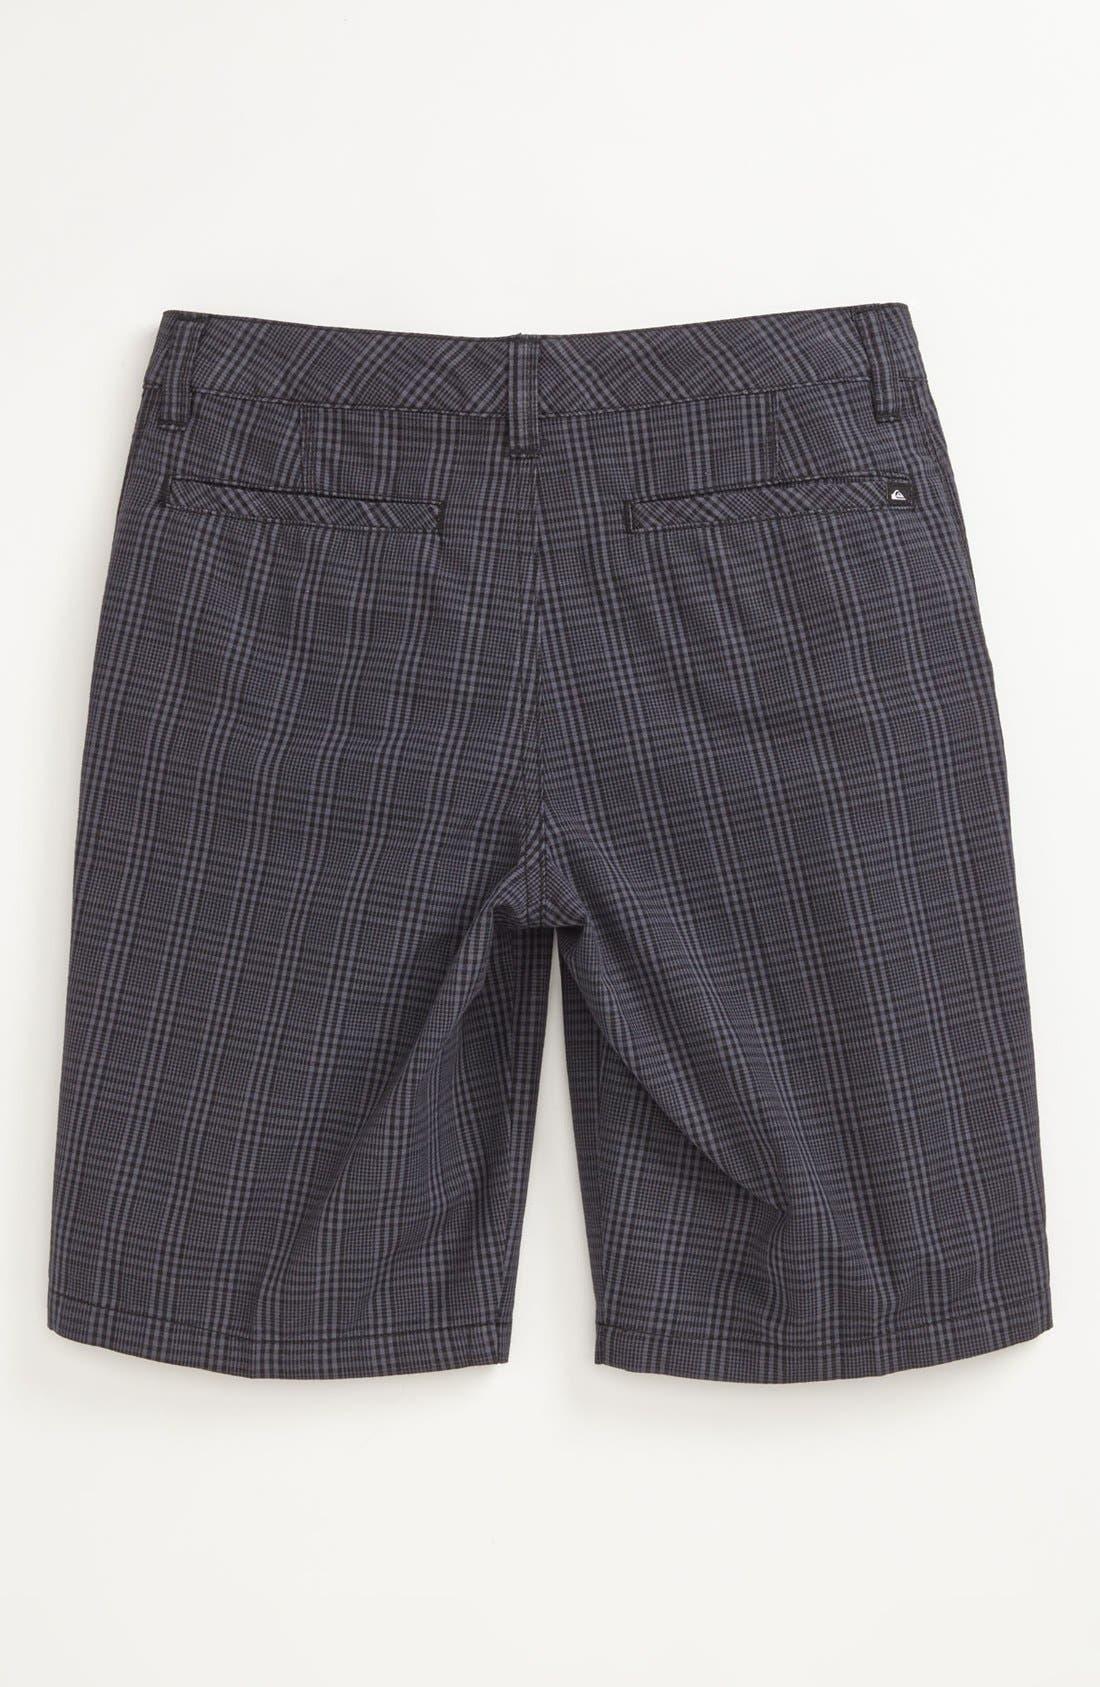 Alternate Image 2  - Quiksilver 'Agenda Suiting' Plaid Shorts (Big Boys)